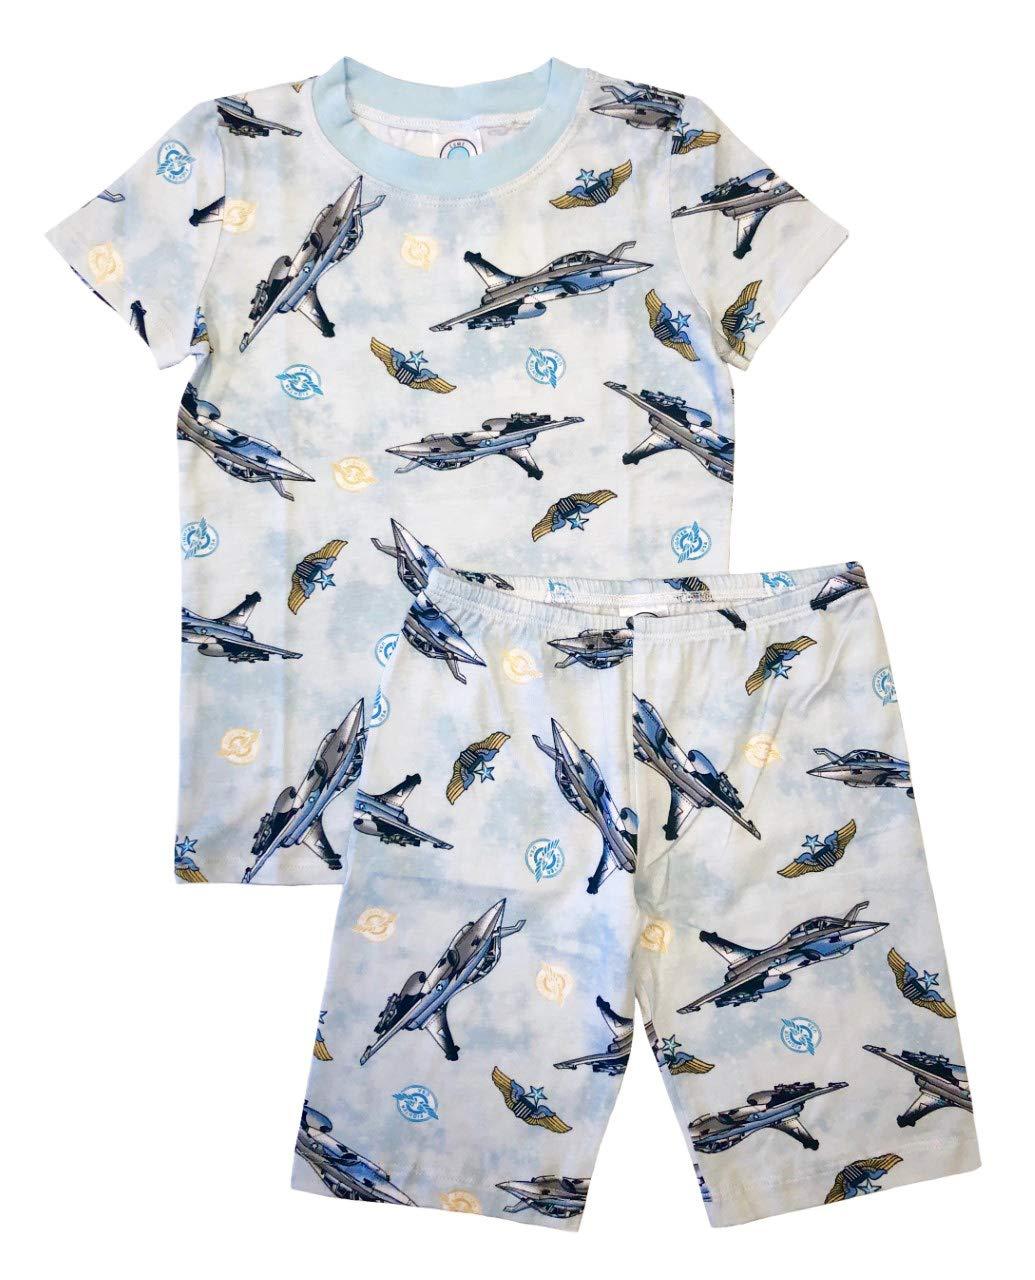 Esme Boys Pajamas Short Sleeve Top Shorts Set 8 Jet